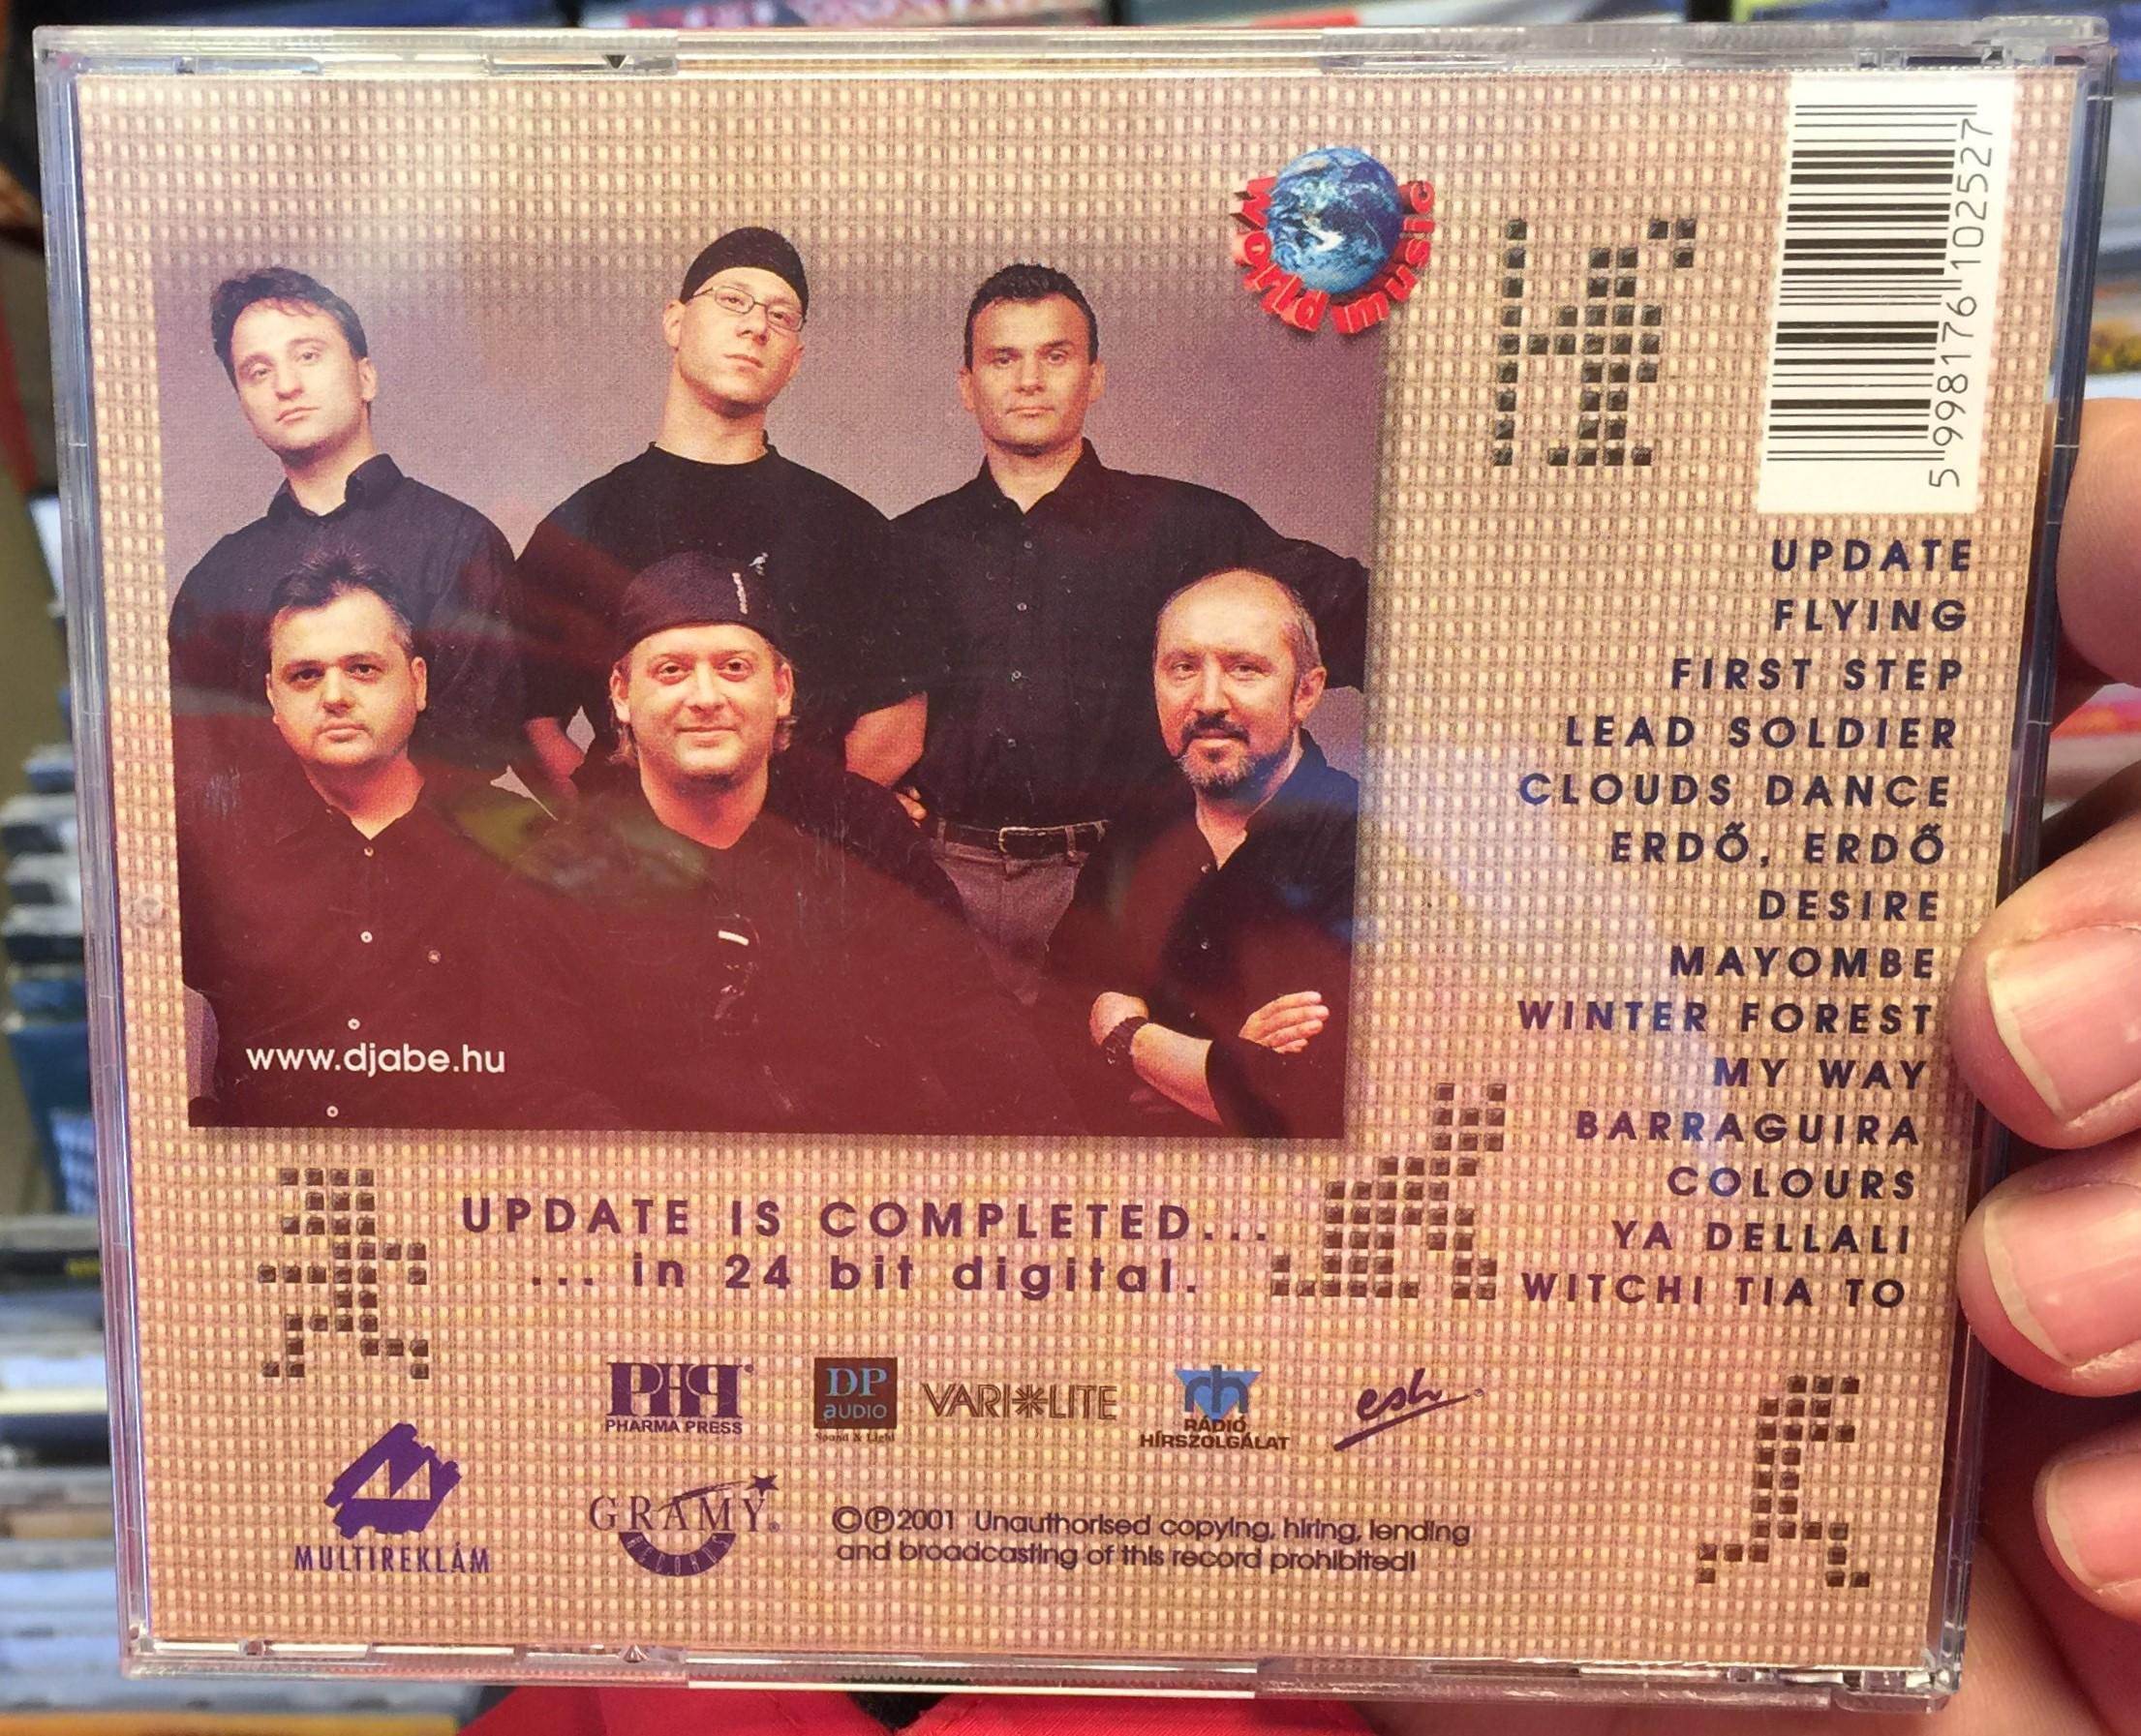 djabe-update-gramy-records-audio-cd-2001-gr-025-2-.jpg